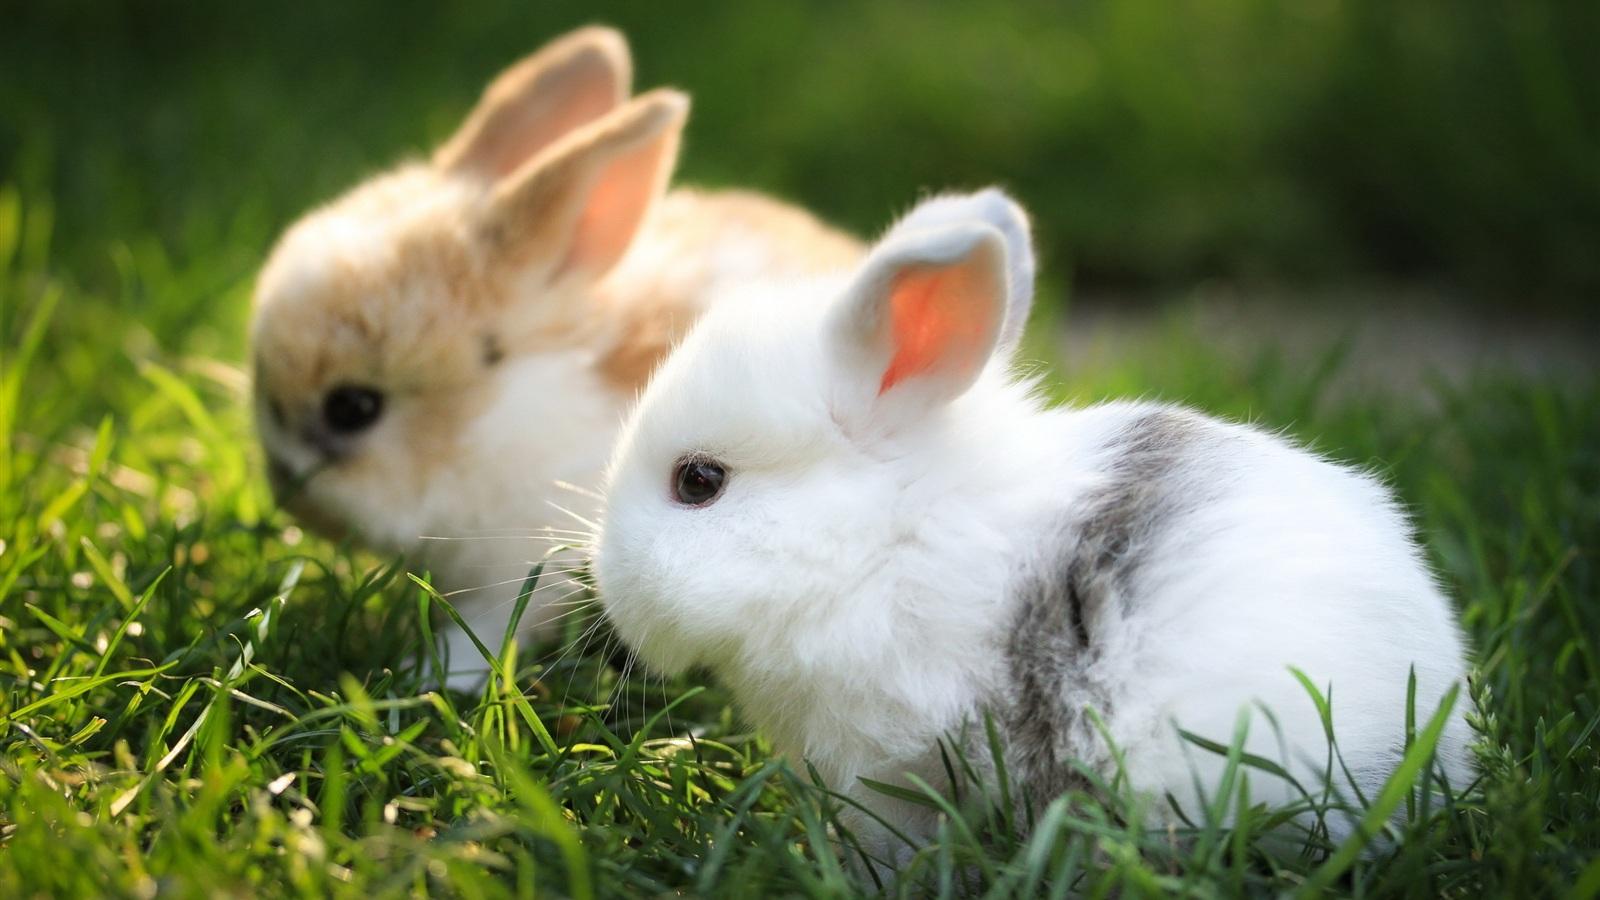 Cute White Rabbit Wallpapers For Desktop: Nagetiere Hasen 2560x1600 HD Hintergrundbilder, HD, Bild